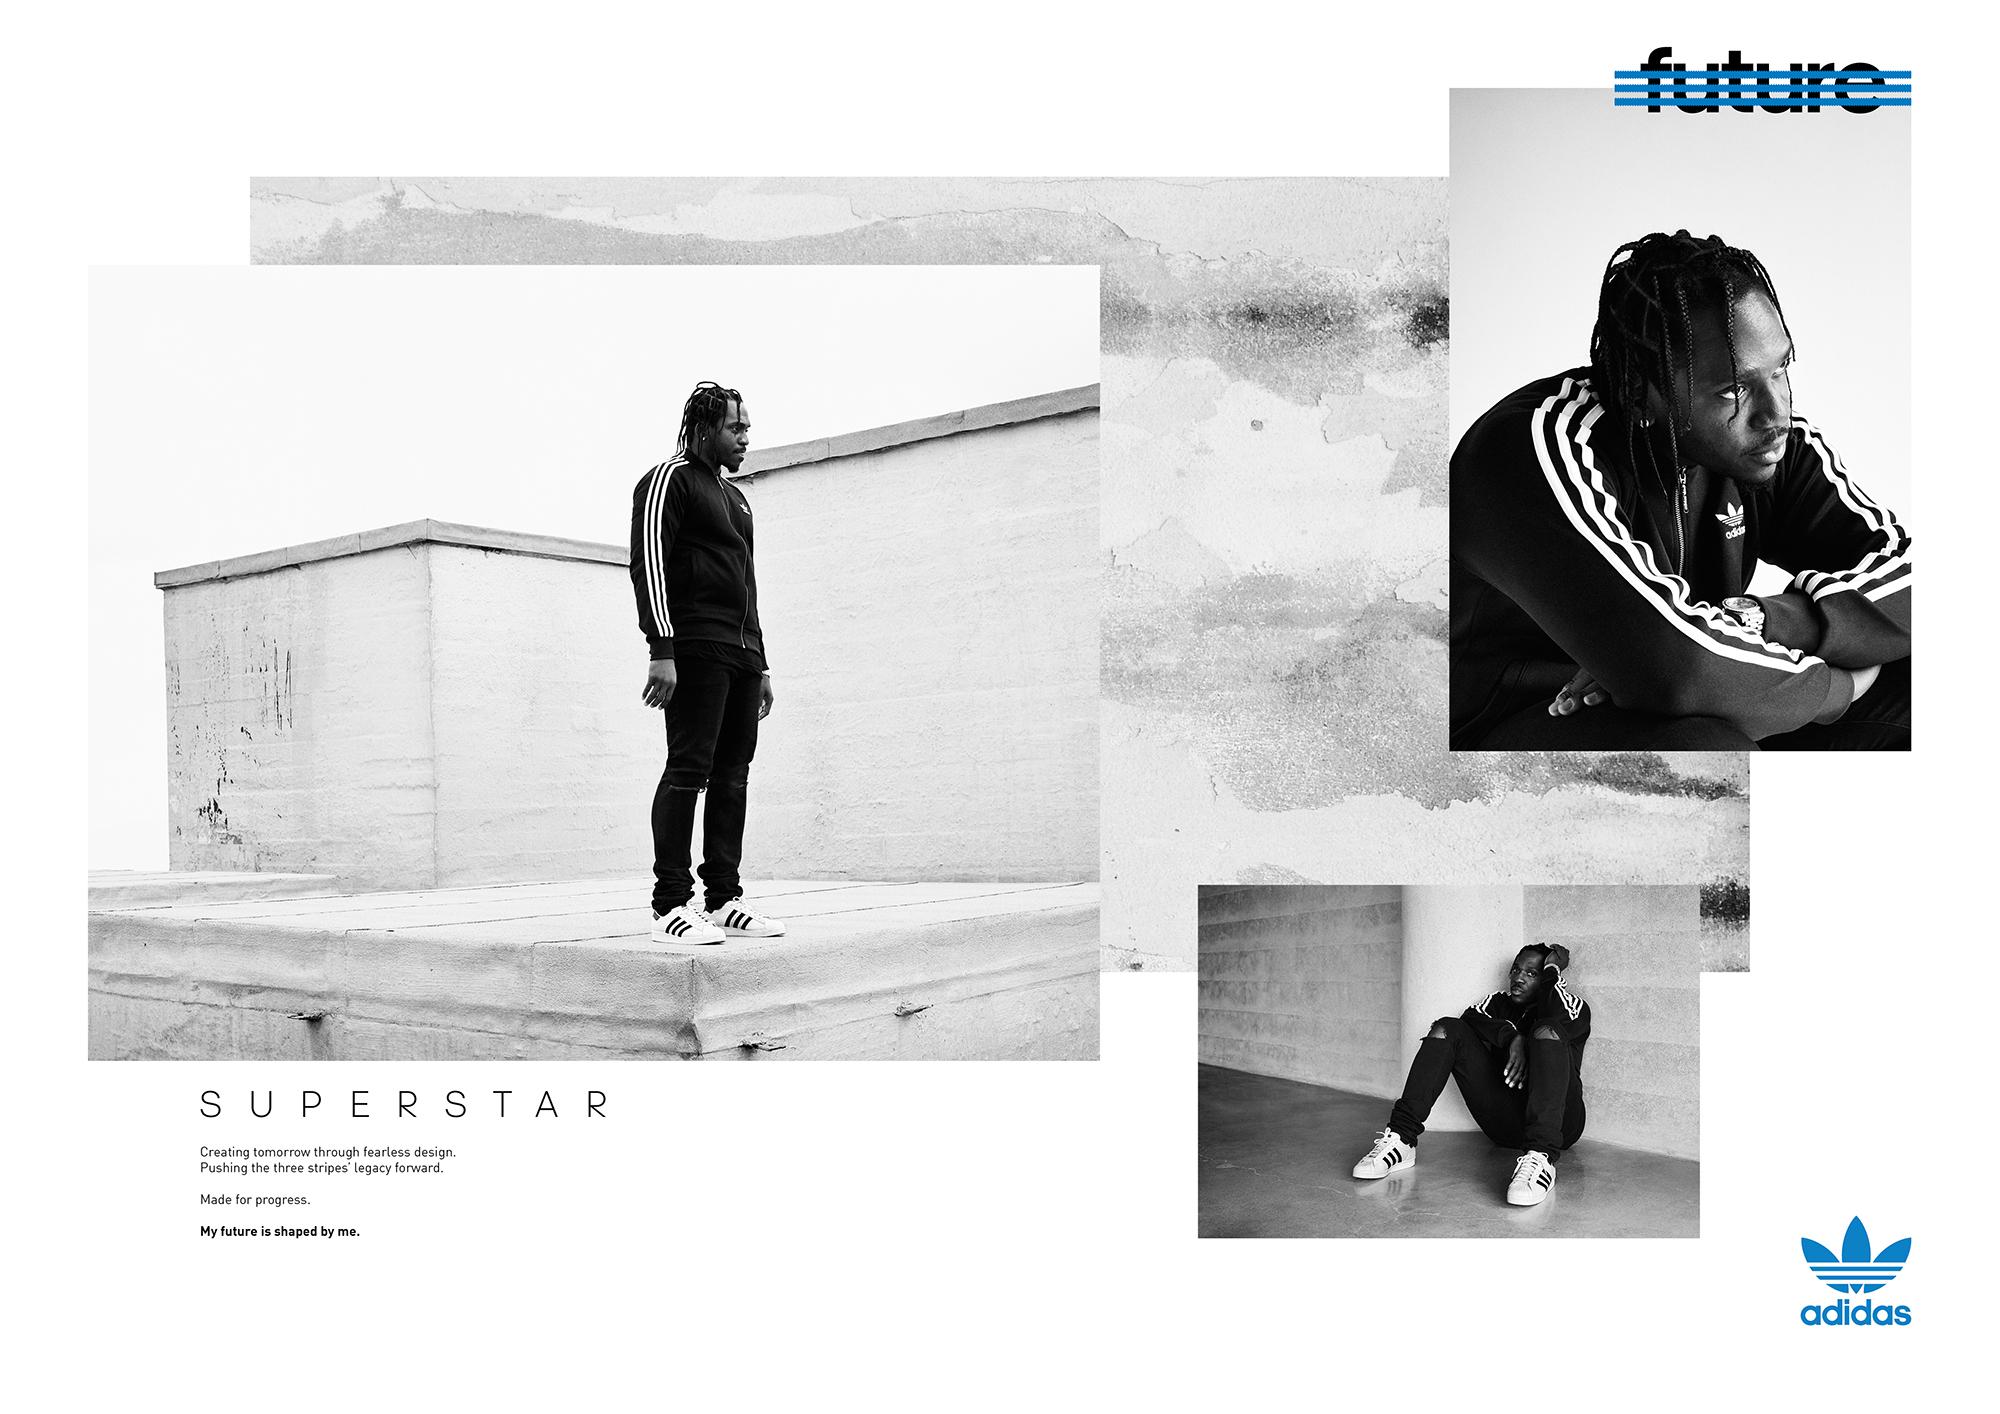 Adidas_SS16_Advertising_35.jpg